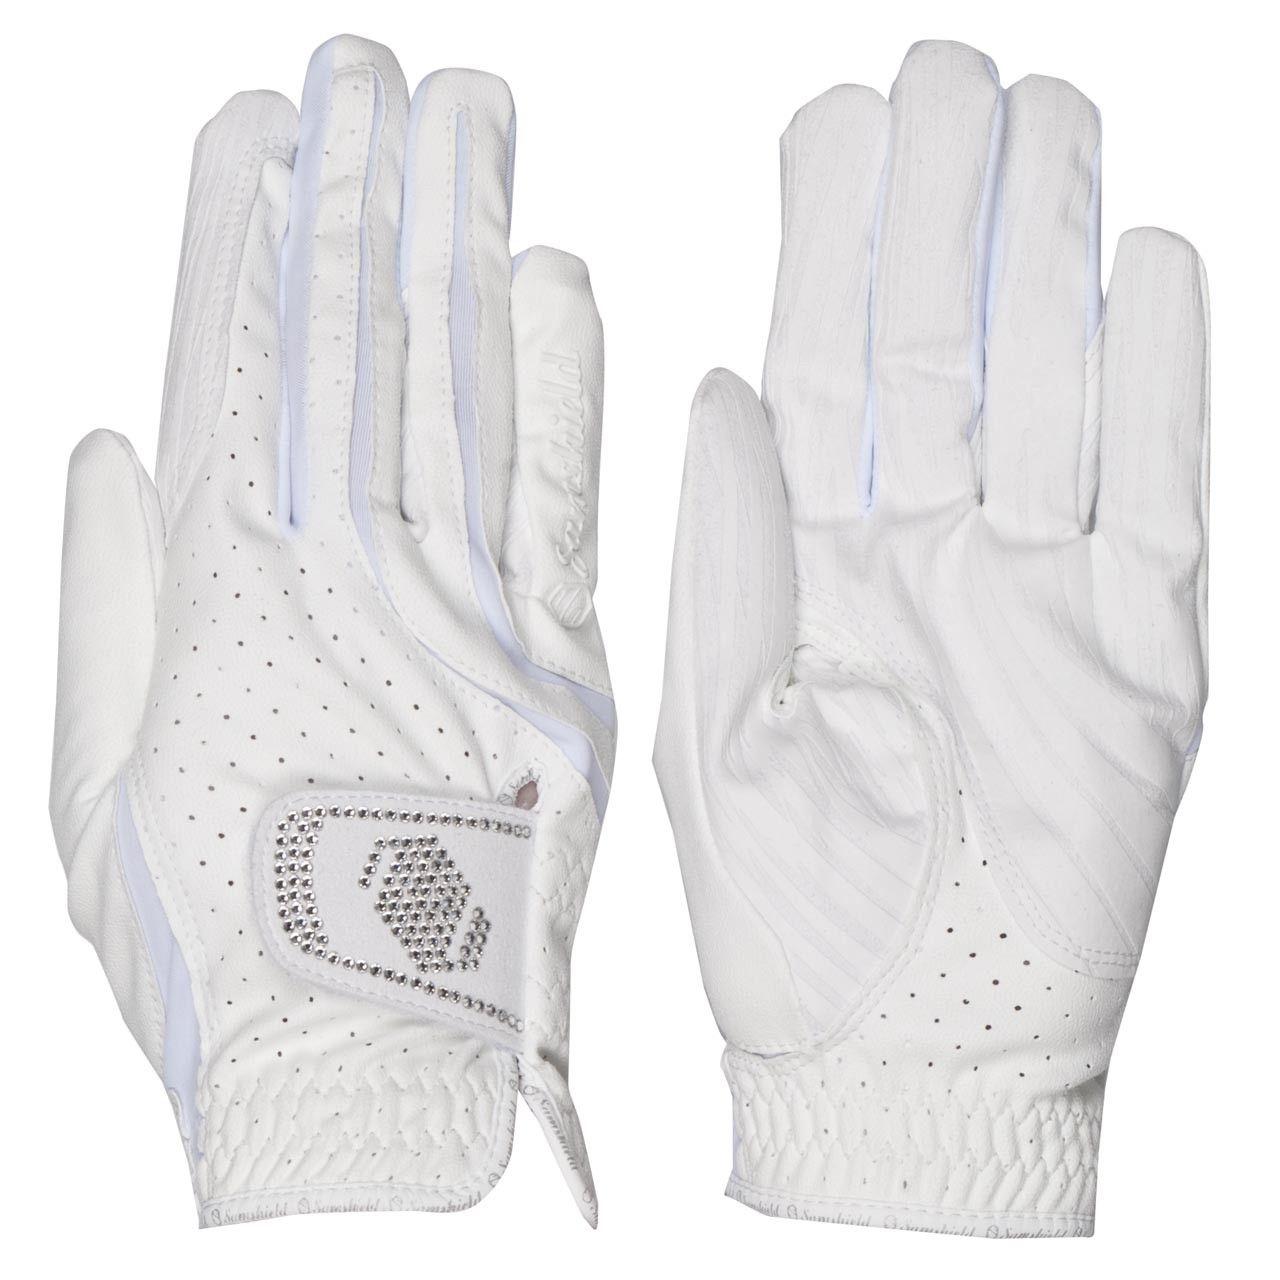 Samshield handschoenen Swarovski wit maat:8,5